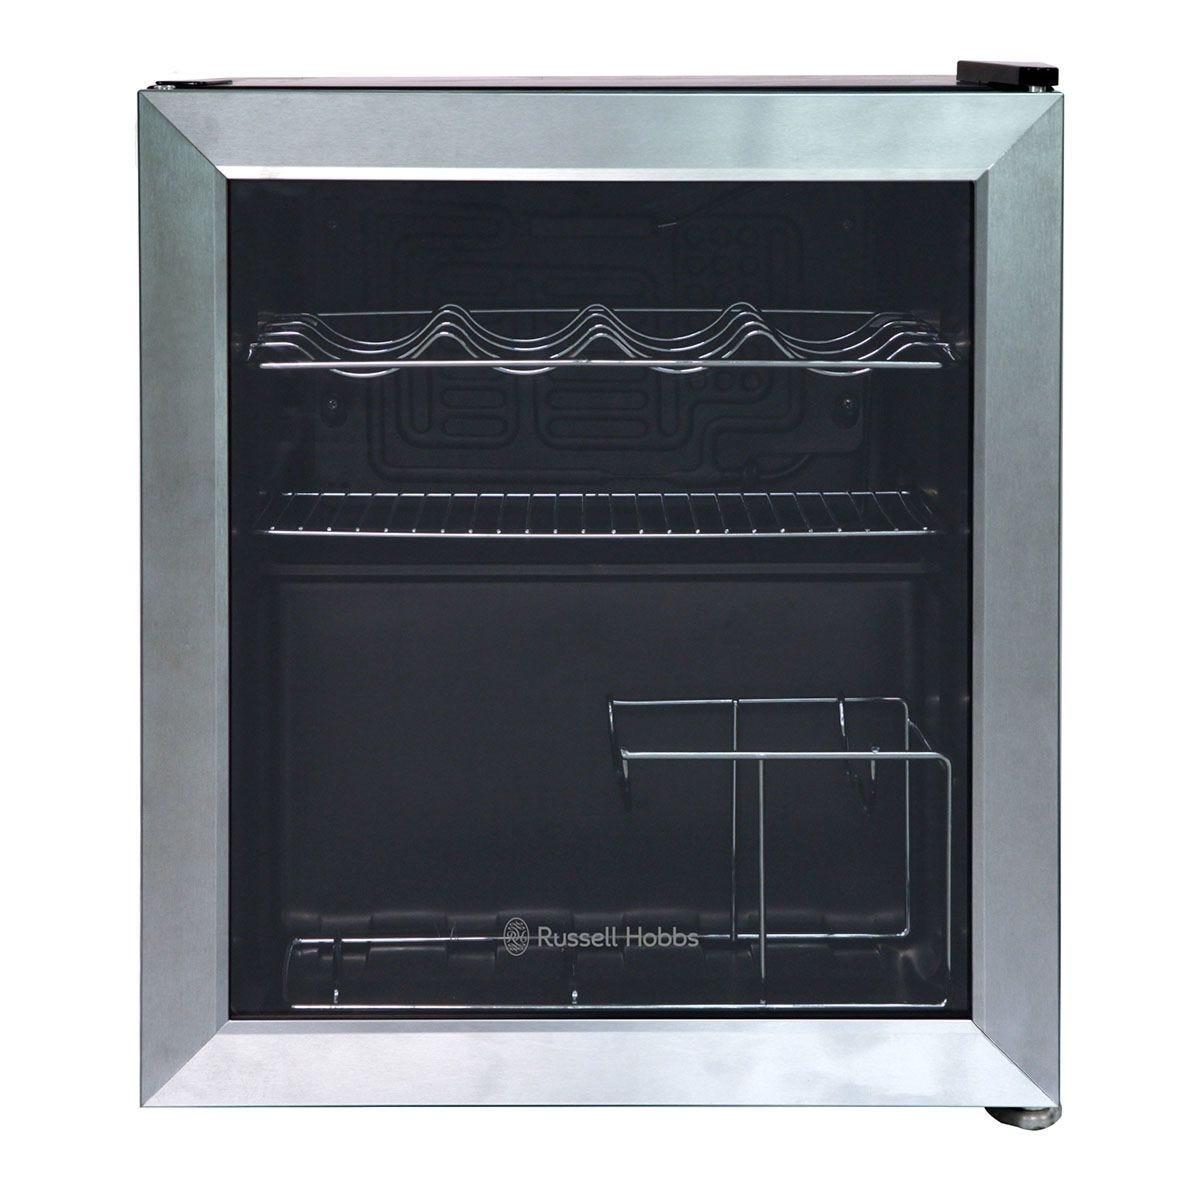 Russell Hobbs RHGWC3SS 47L Glass Door Drinks Cooler – Stainless Steel